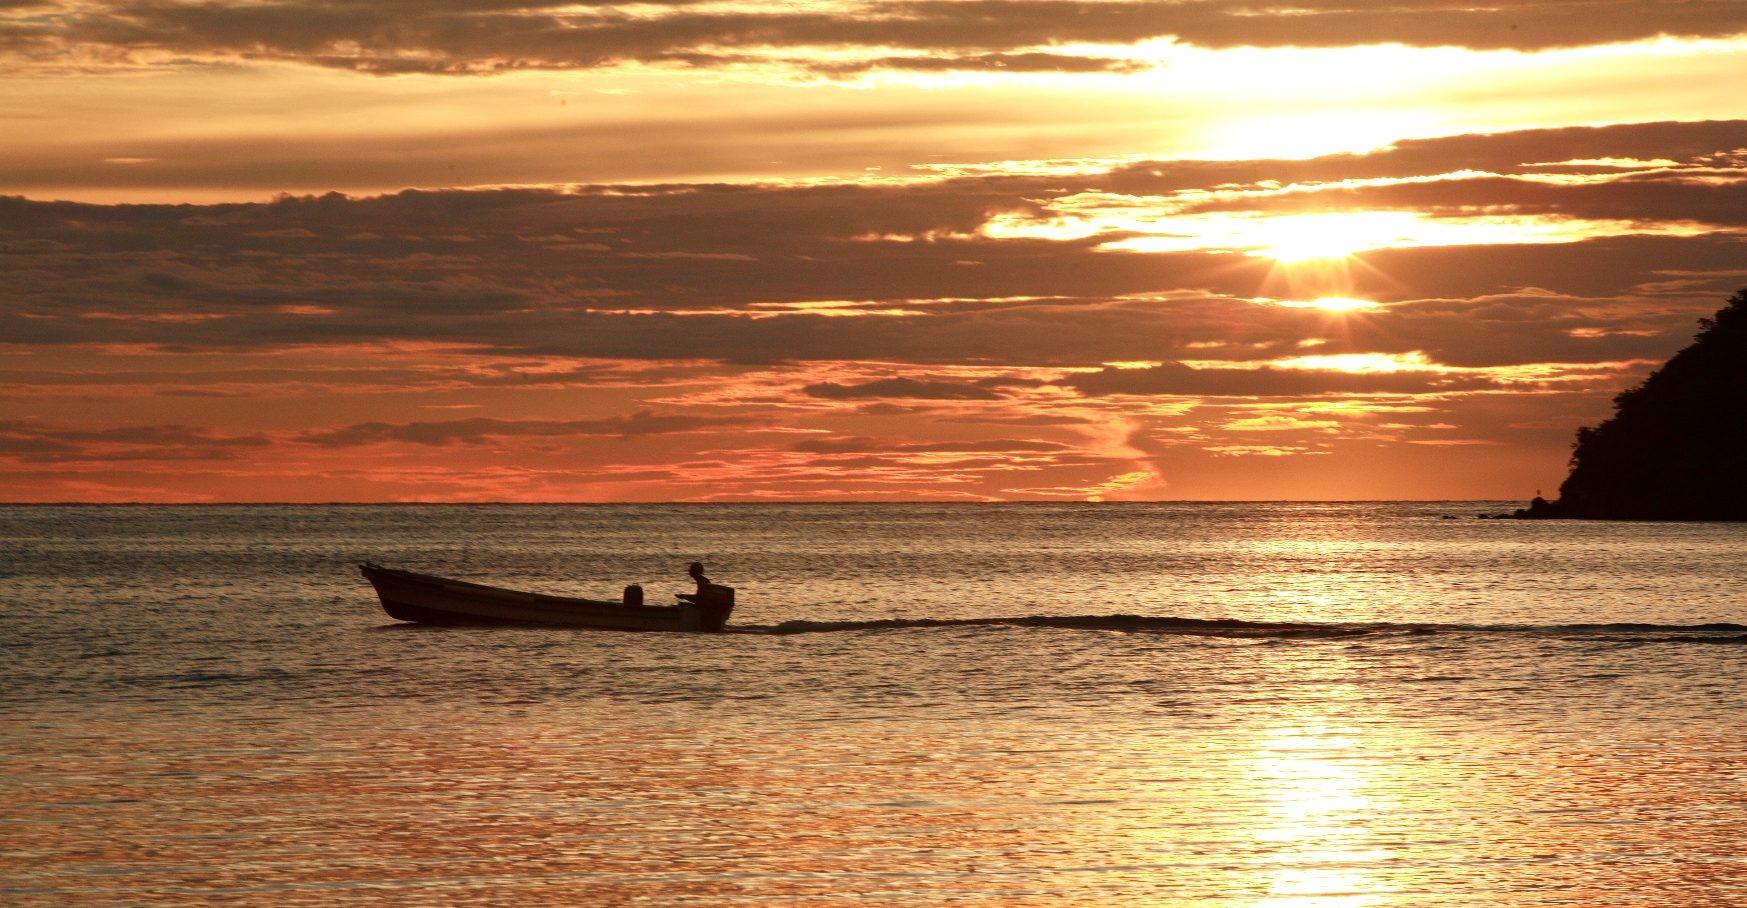 Kolumbien_Providencia_Boot im Sonnenuntergang_Reisen